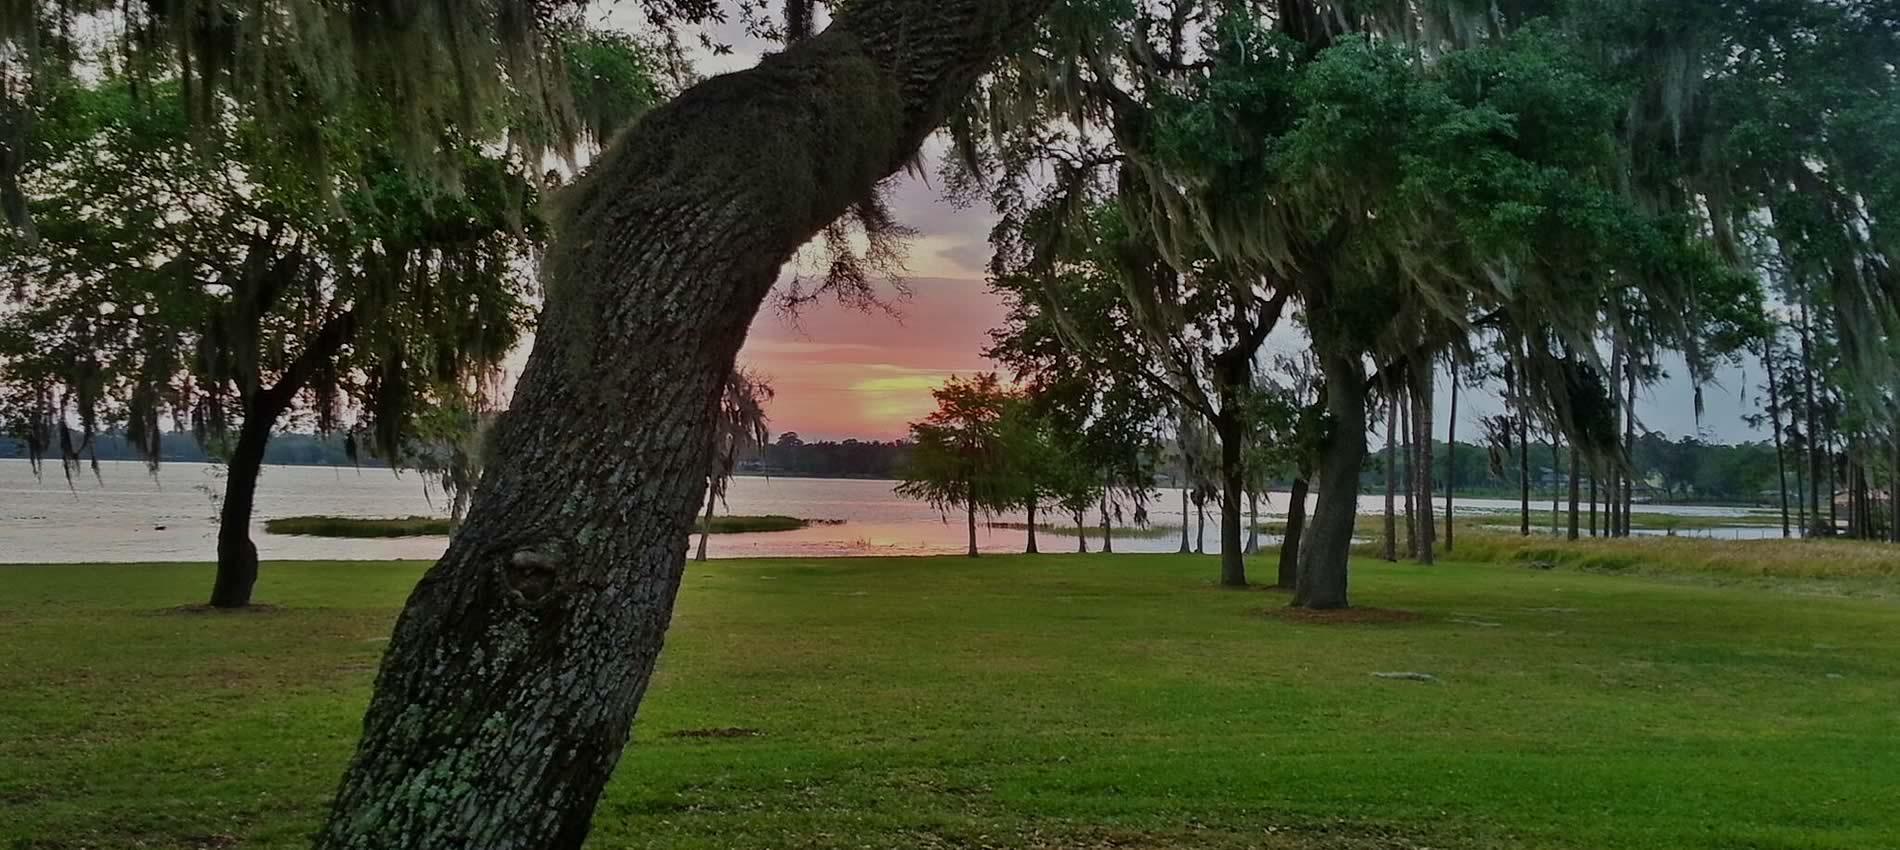 Orlando Sunset - Orlando Regional Realty